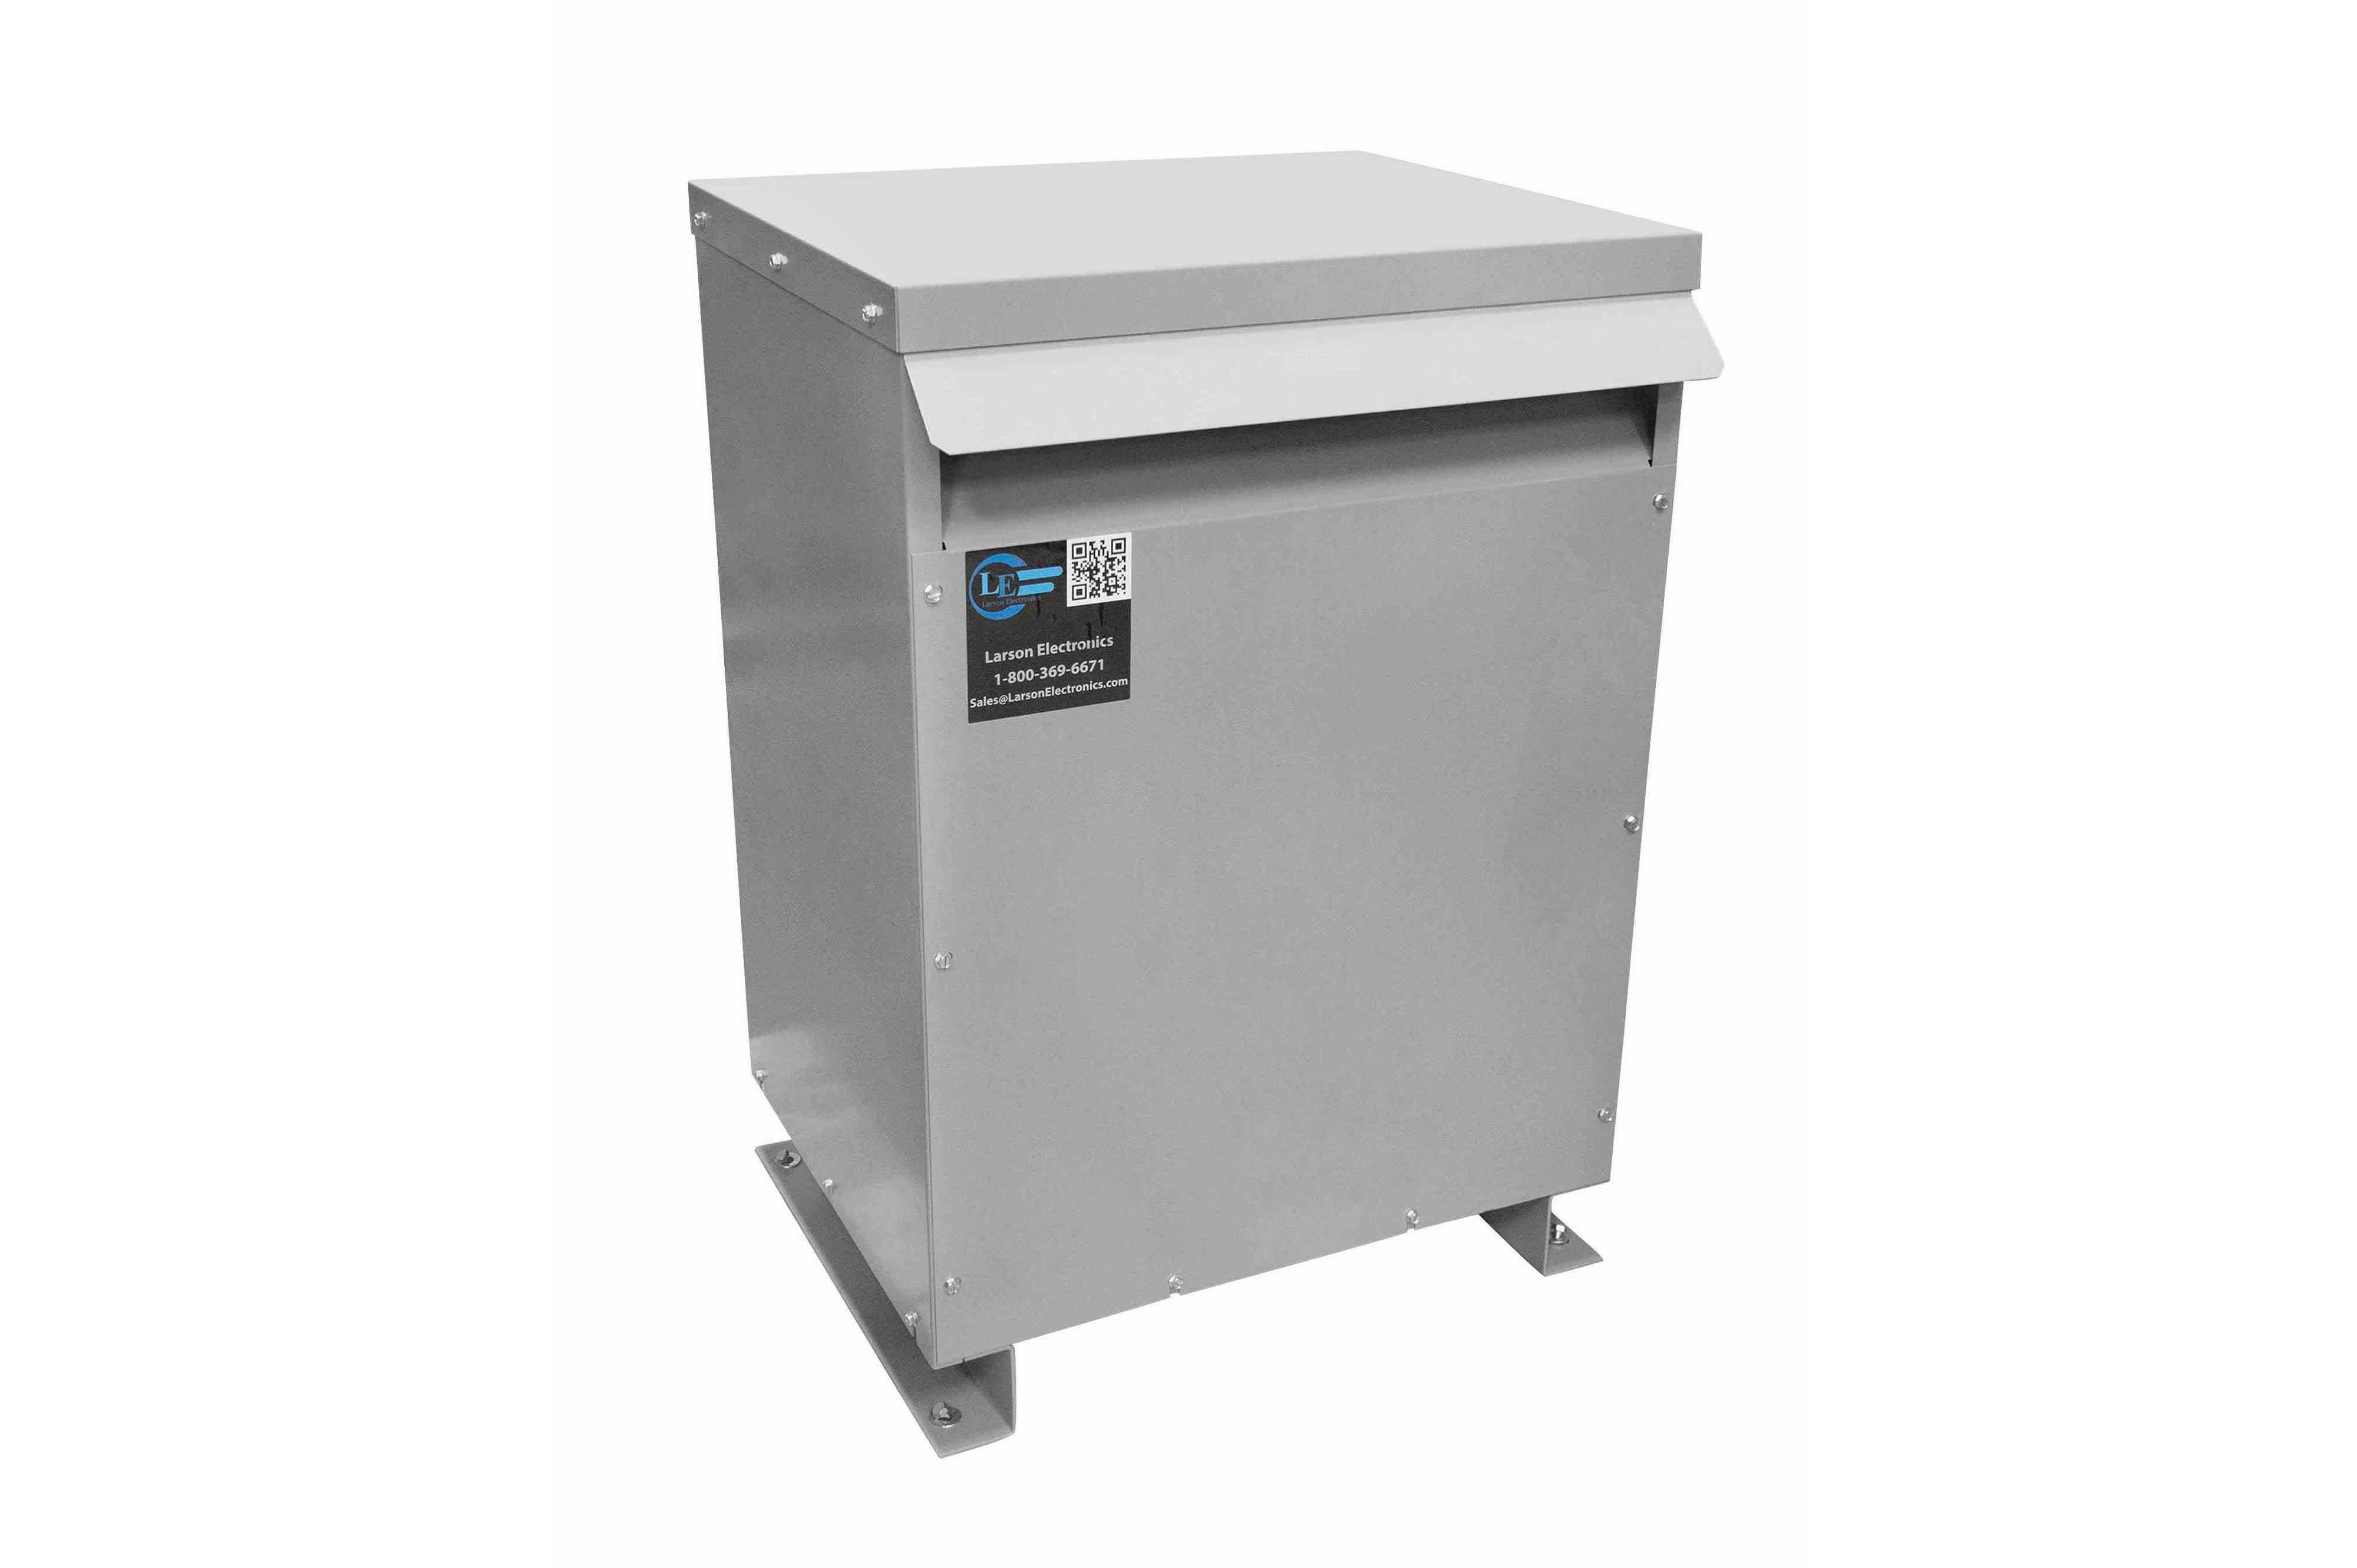 14 kVA 3PH Isolation Transformer, 240V Wye Primary, 380V Delta Secondary, N3R, Ventilated, 60 Hz